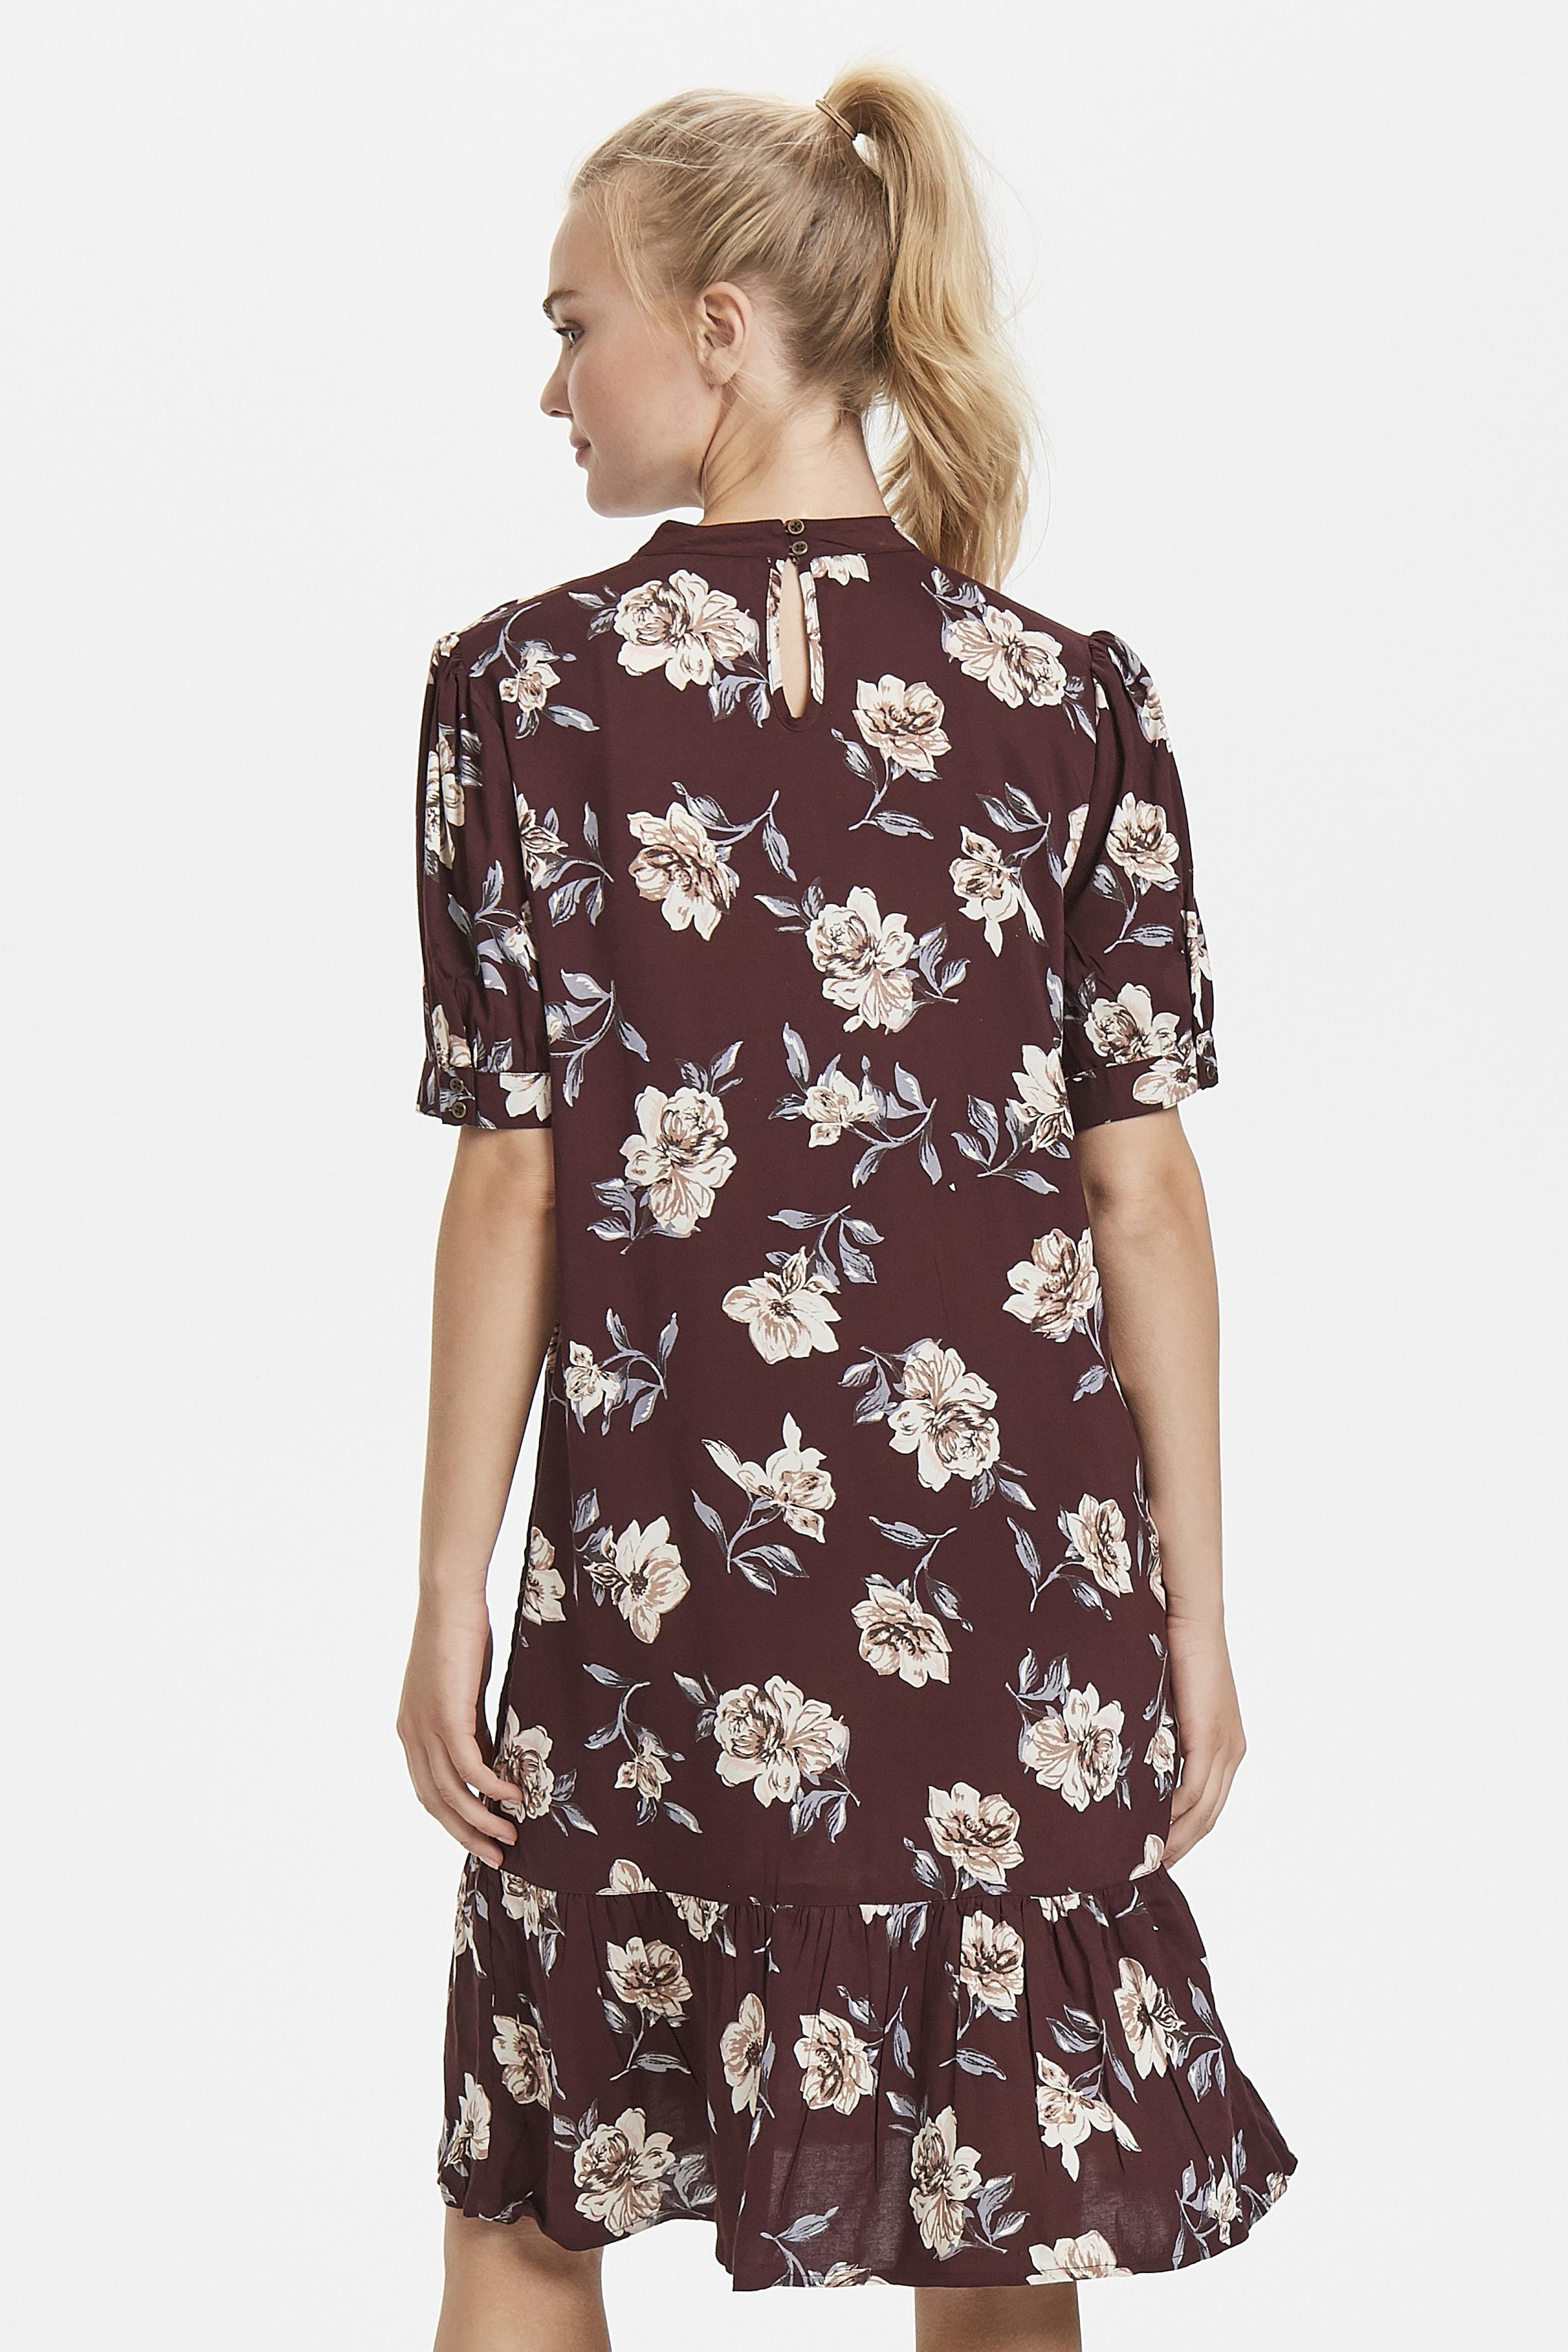 Bordeaux/wollweiß Kleid von Bon'A Parte – Shoppen Sie Bordeaux/wollweiß Kleid ab Gr. S-2XL hier